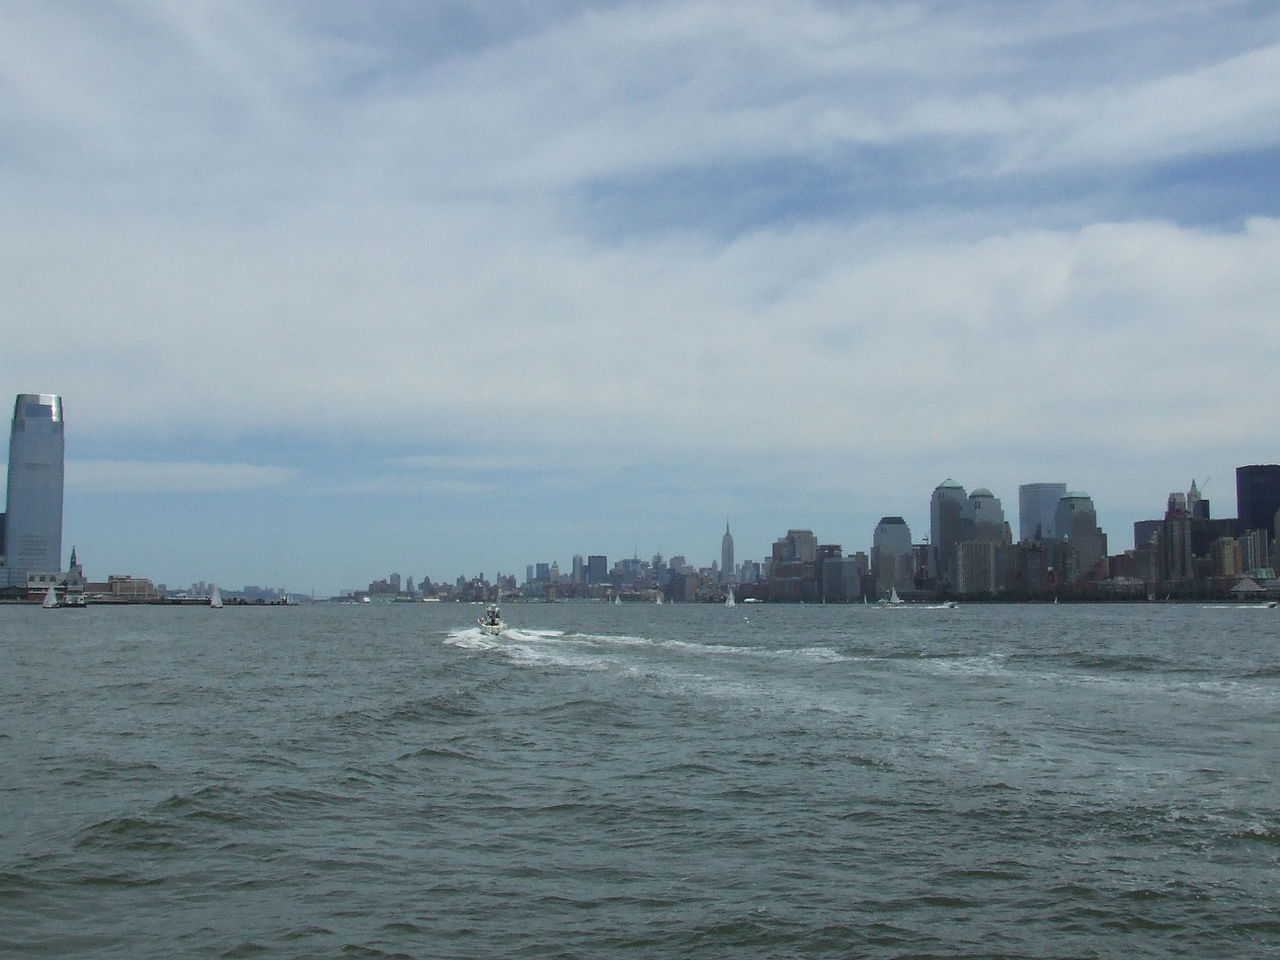 Beyond the Hudson River